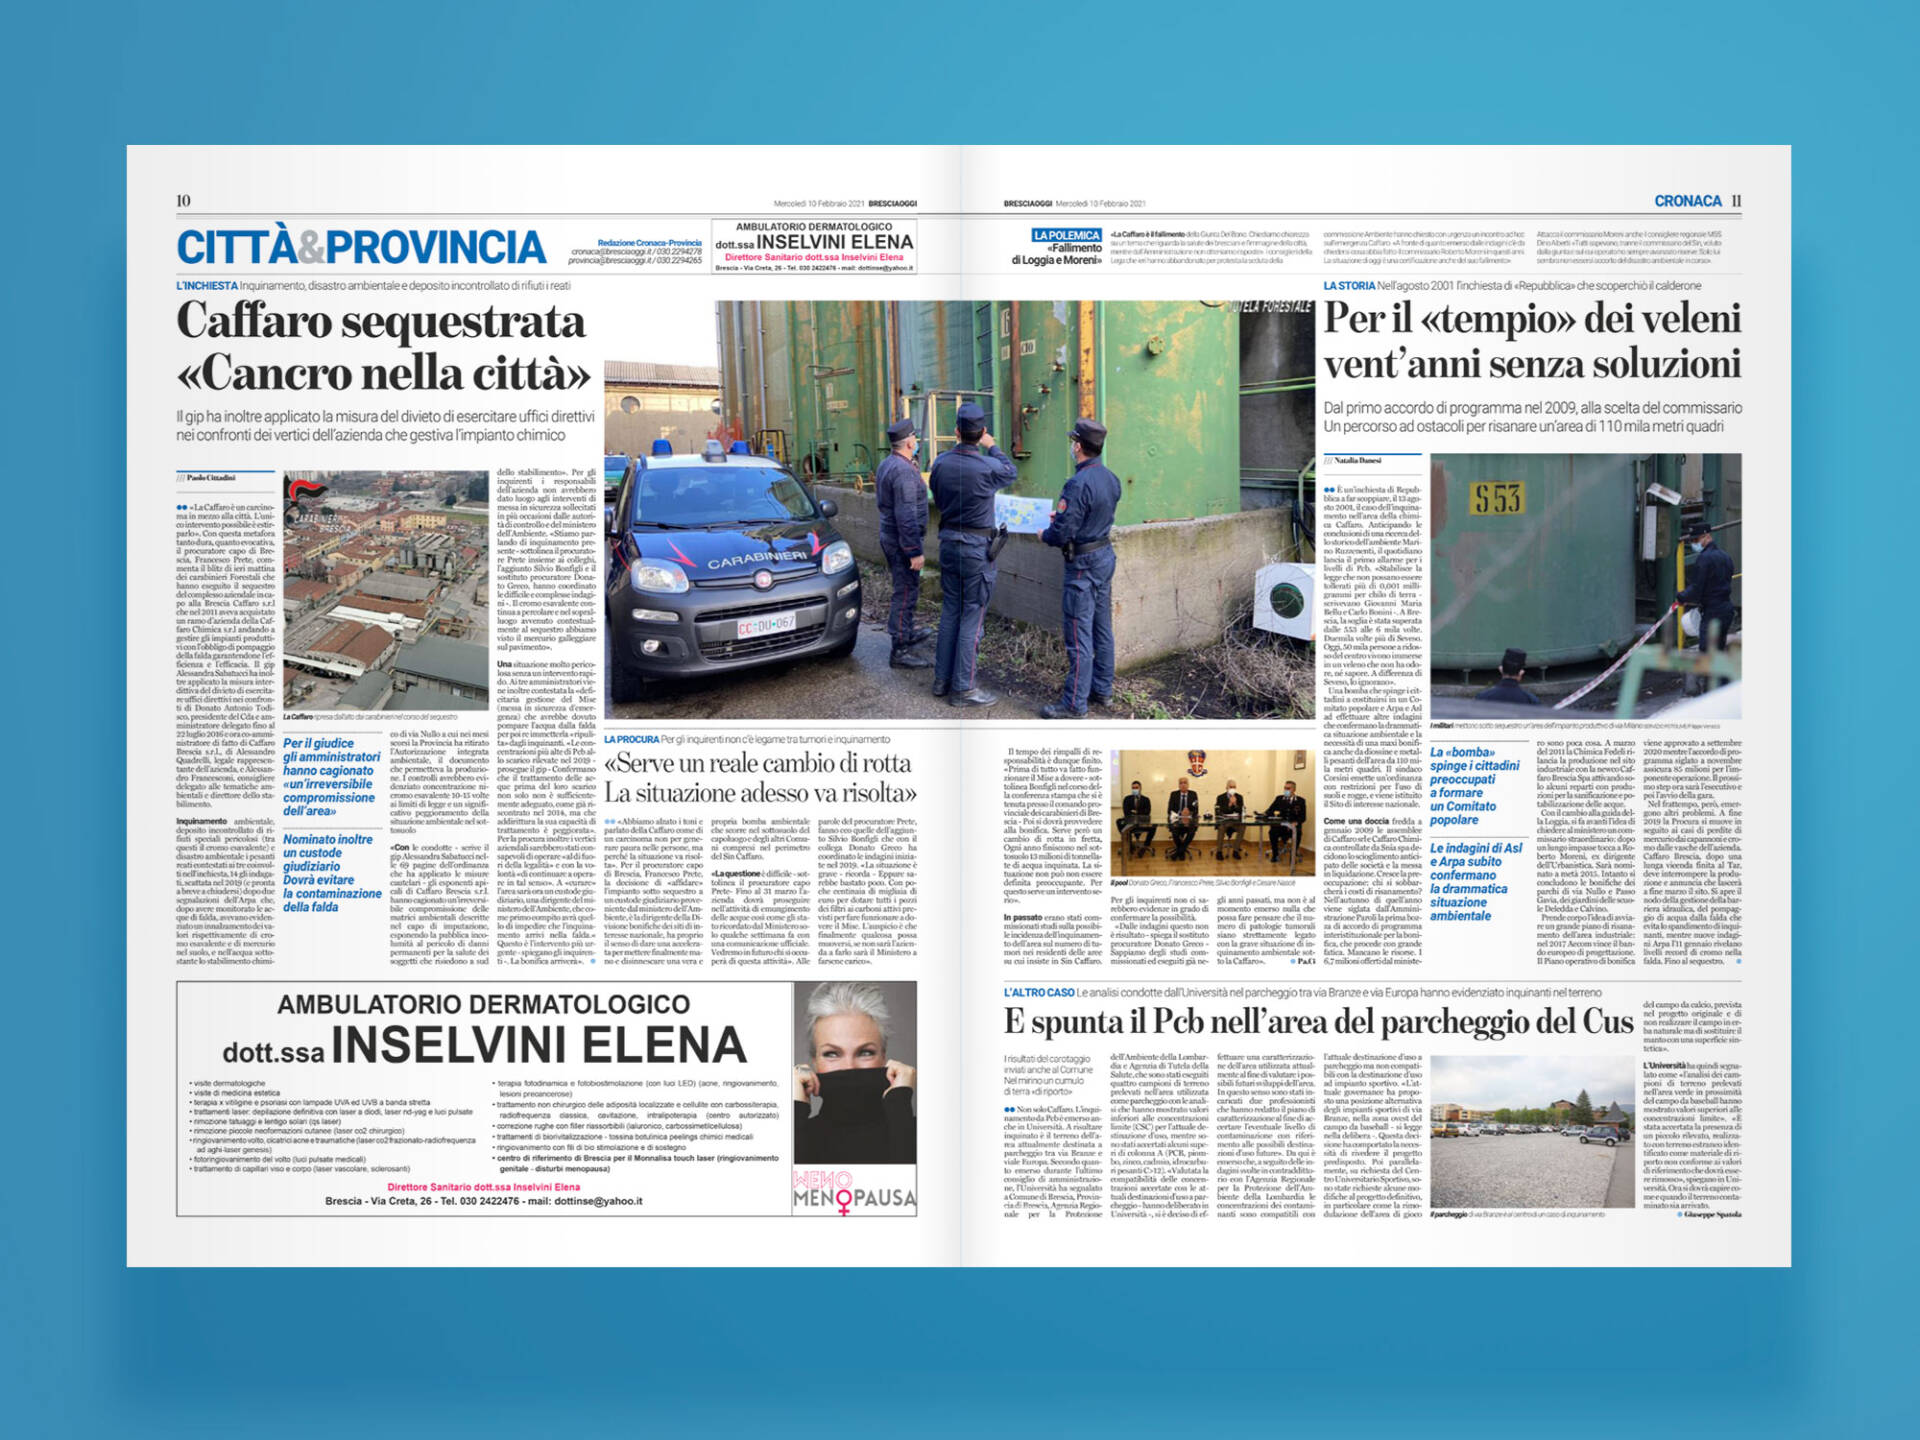 BresciaOggi_032021_Wenceslau_News_Design